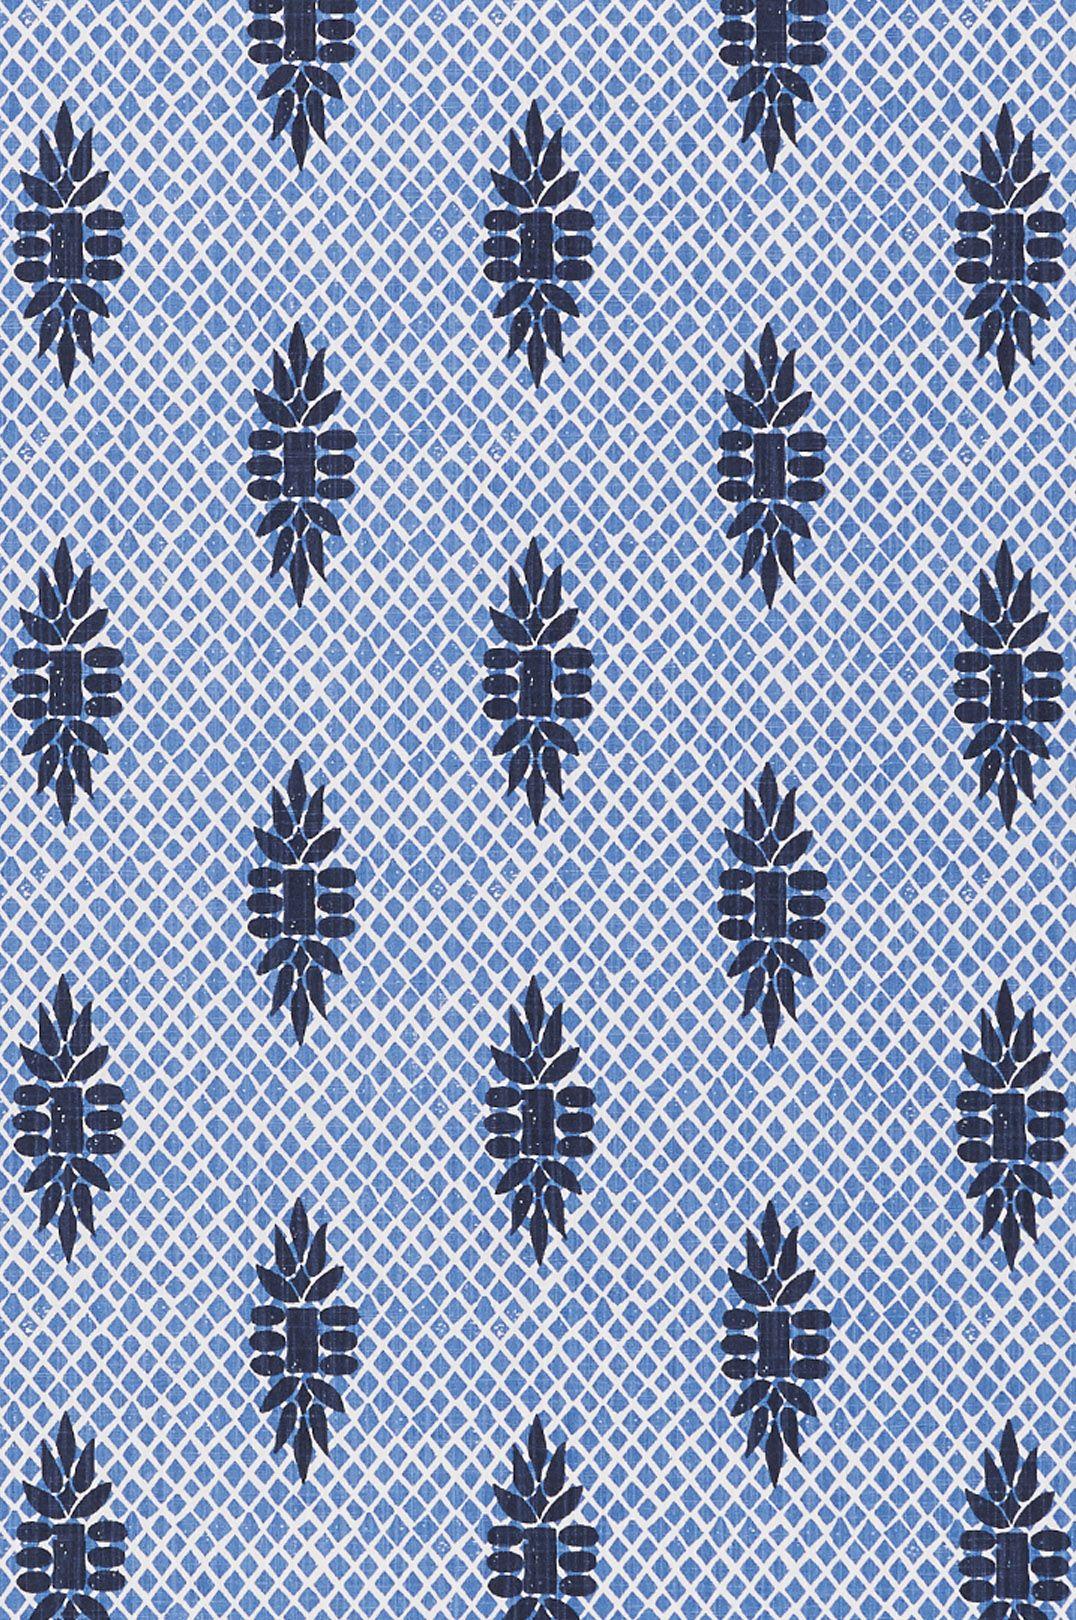 lacefield boca wedgewood blue block print designer fabric by the lacefield boca wedgewood blue block print designer fabric by the yard perfect for drapery or